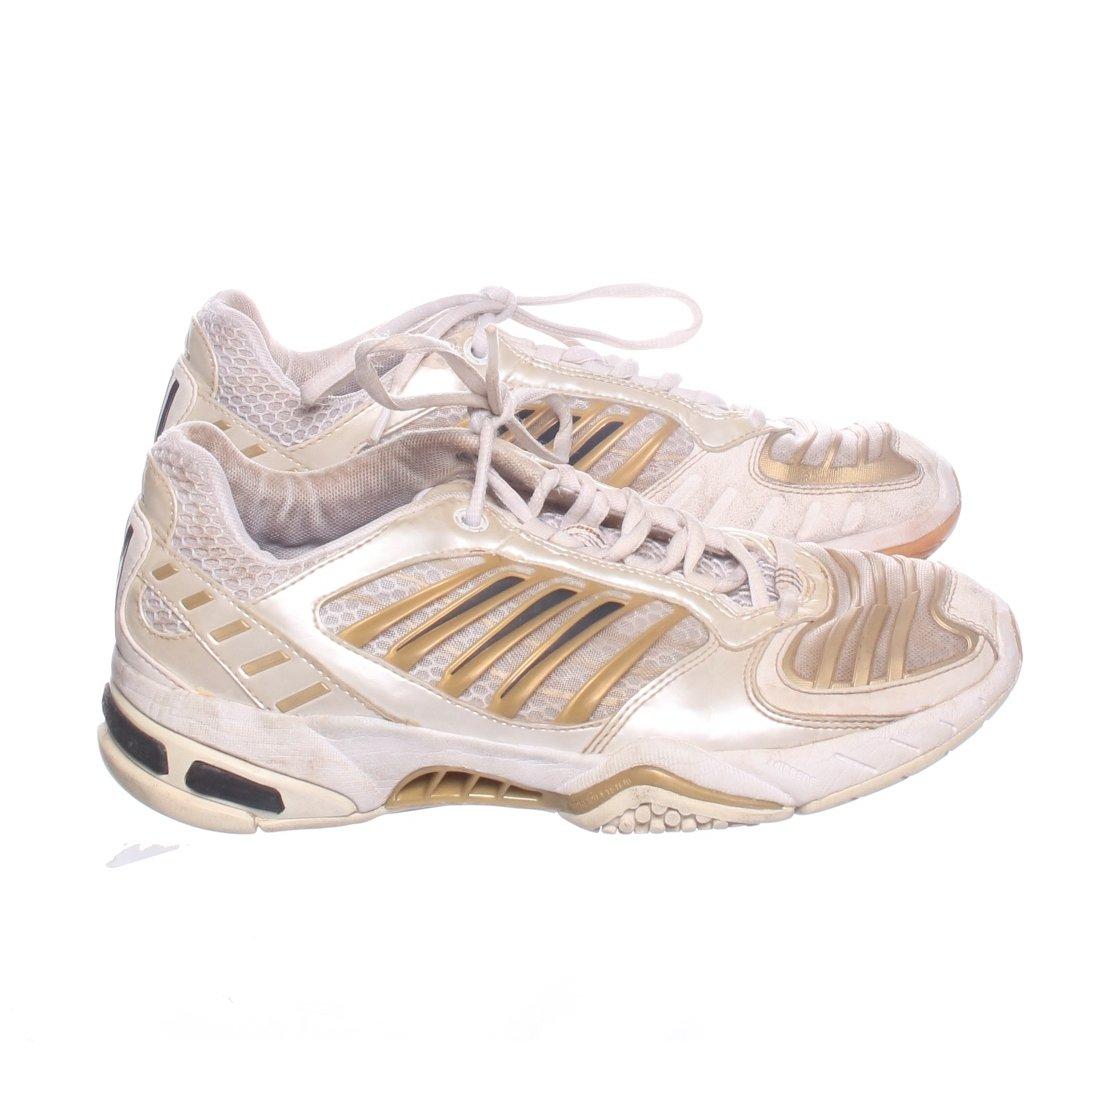 buy online de0a3 59e04 Adidas, Tennisskor, Strl  38 2 3, adiPrene, Vit Guldfärgad